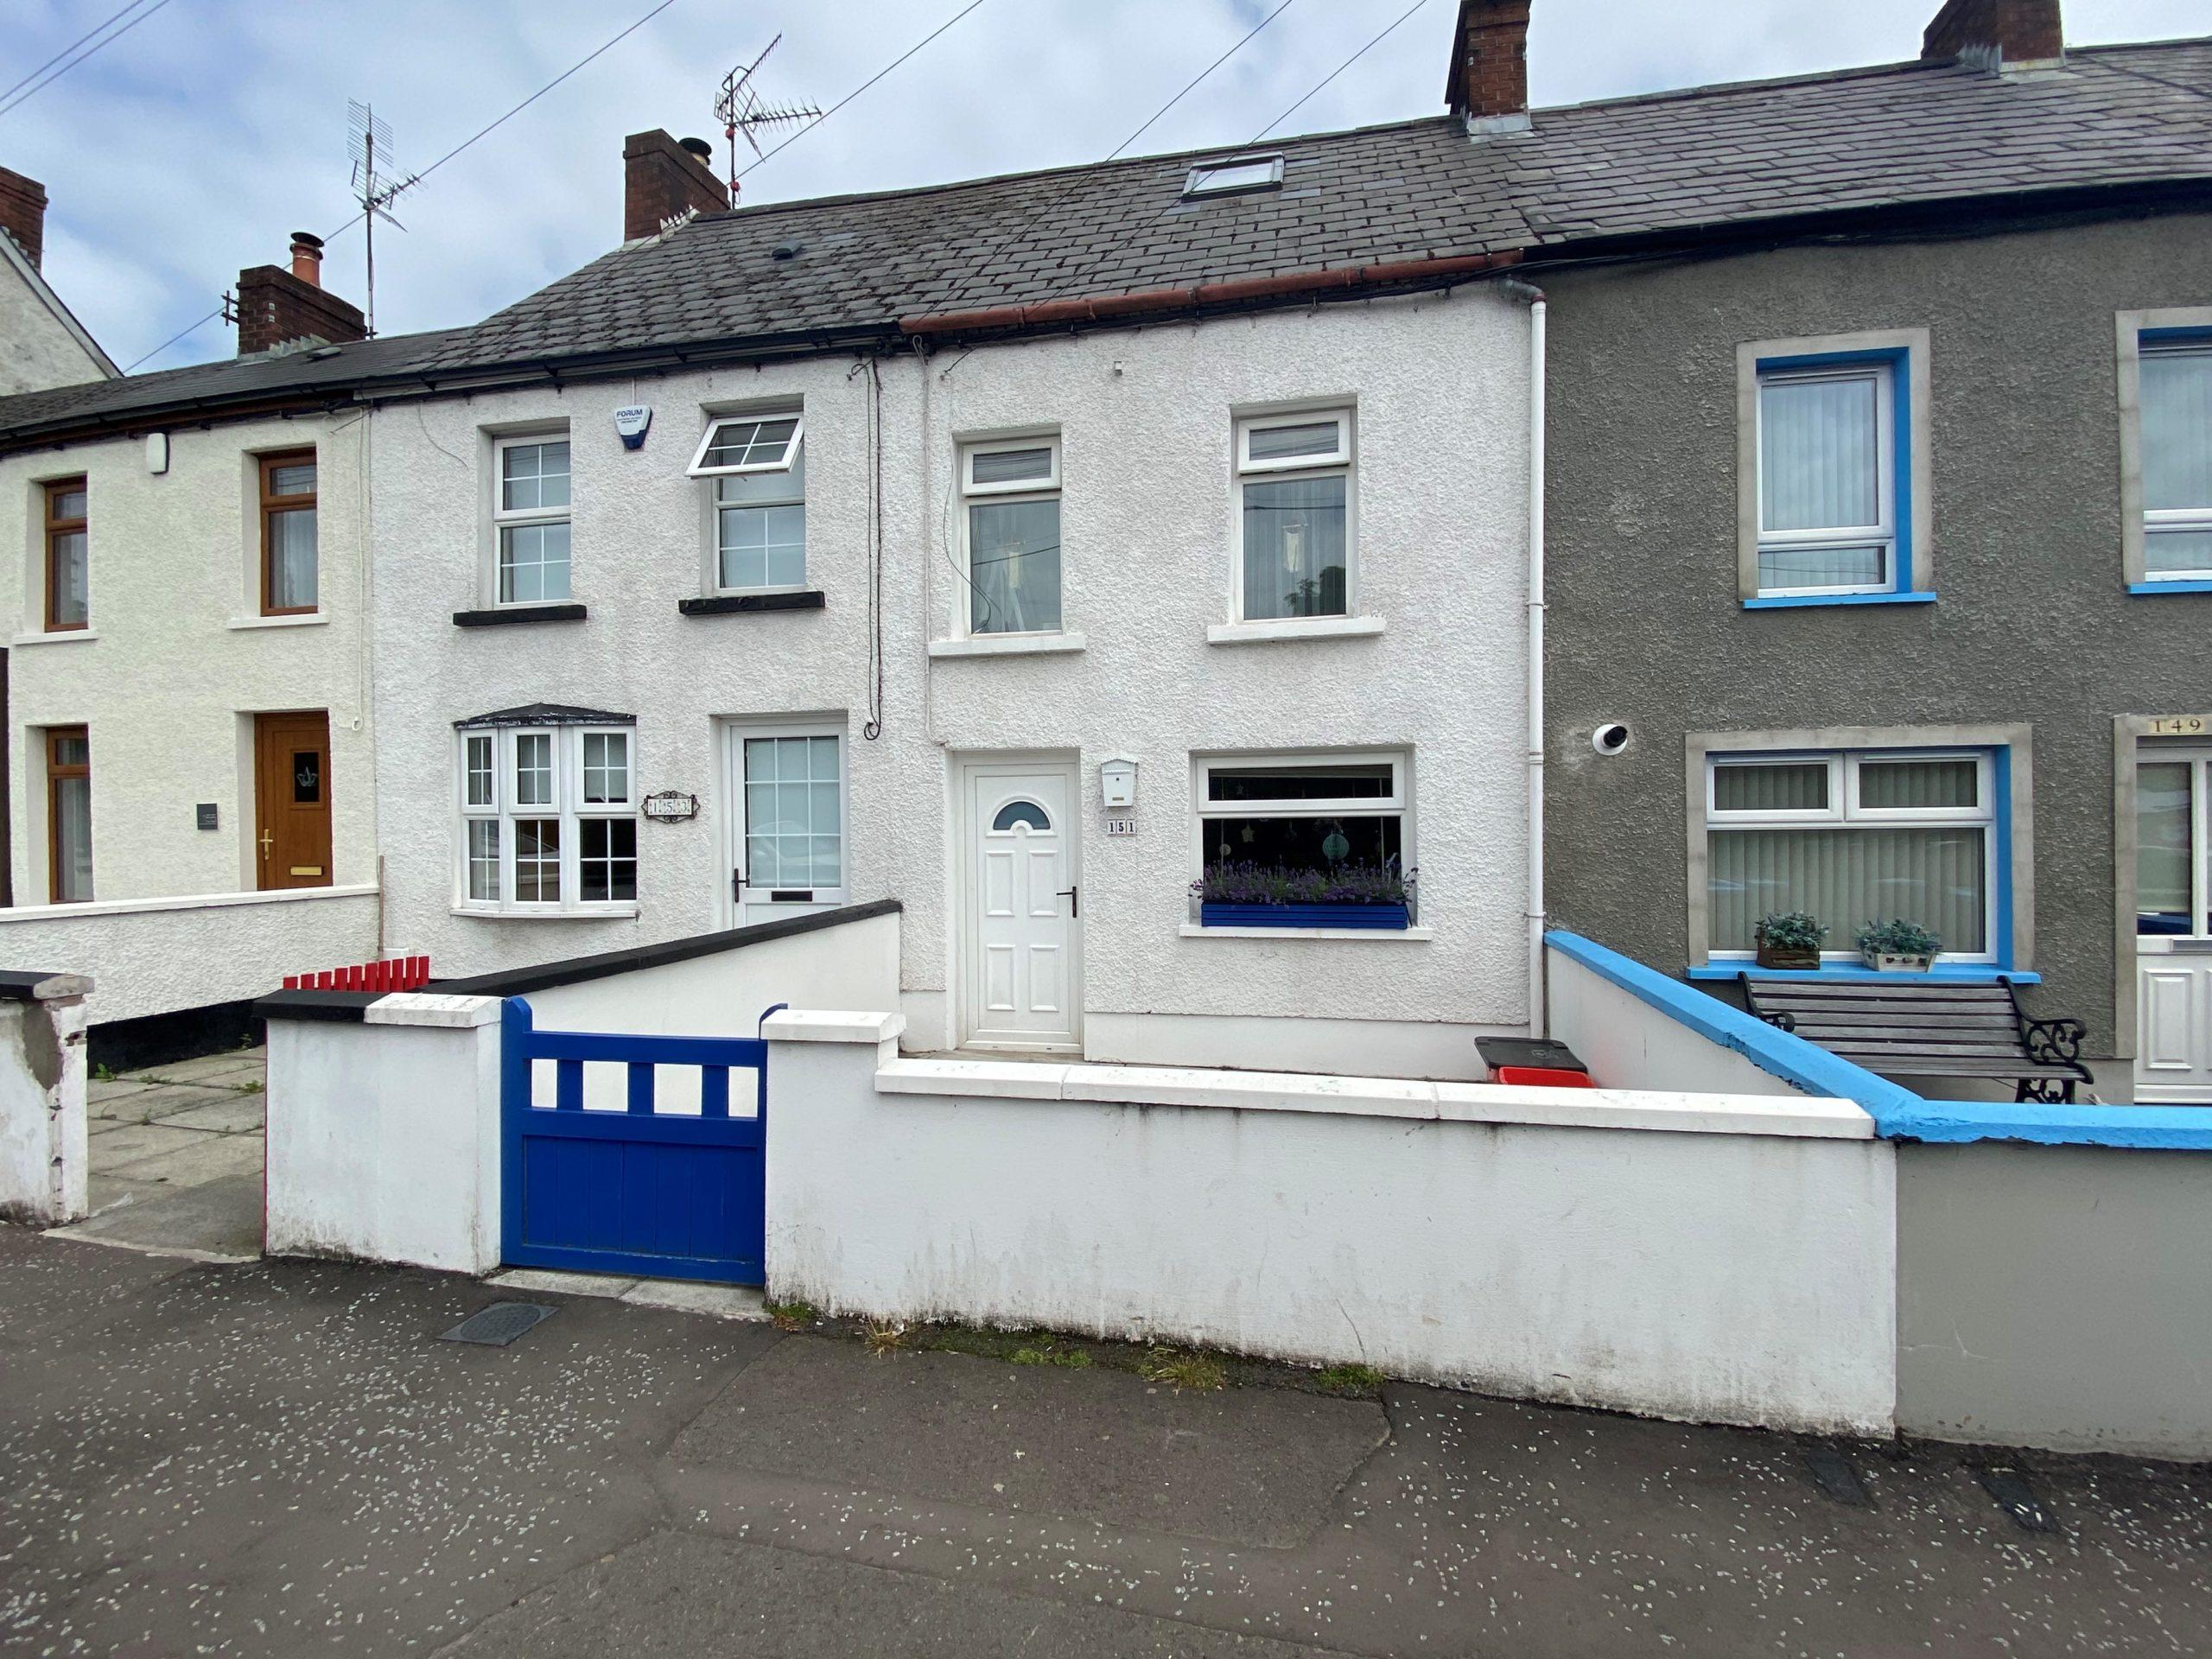 Image of 151 Ballymoney Road, Ballymena, Co Antrim, BT43 5BX